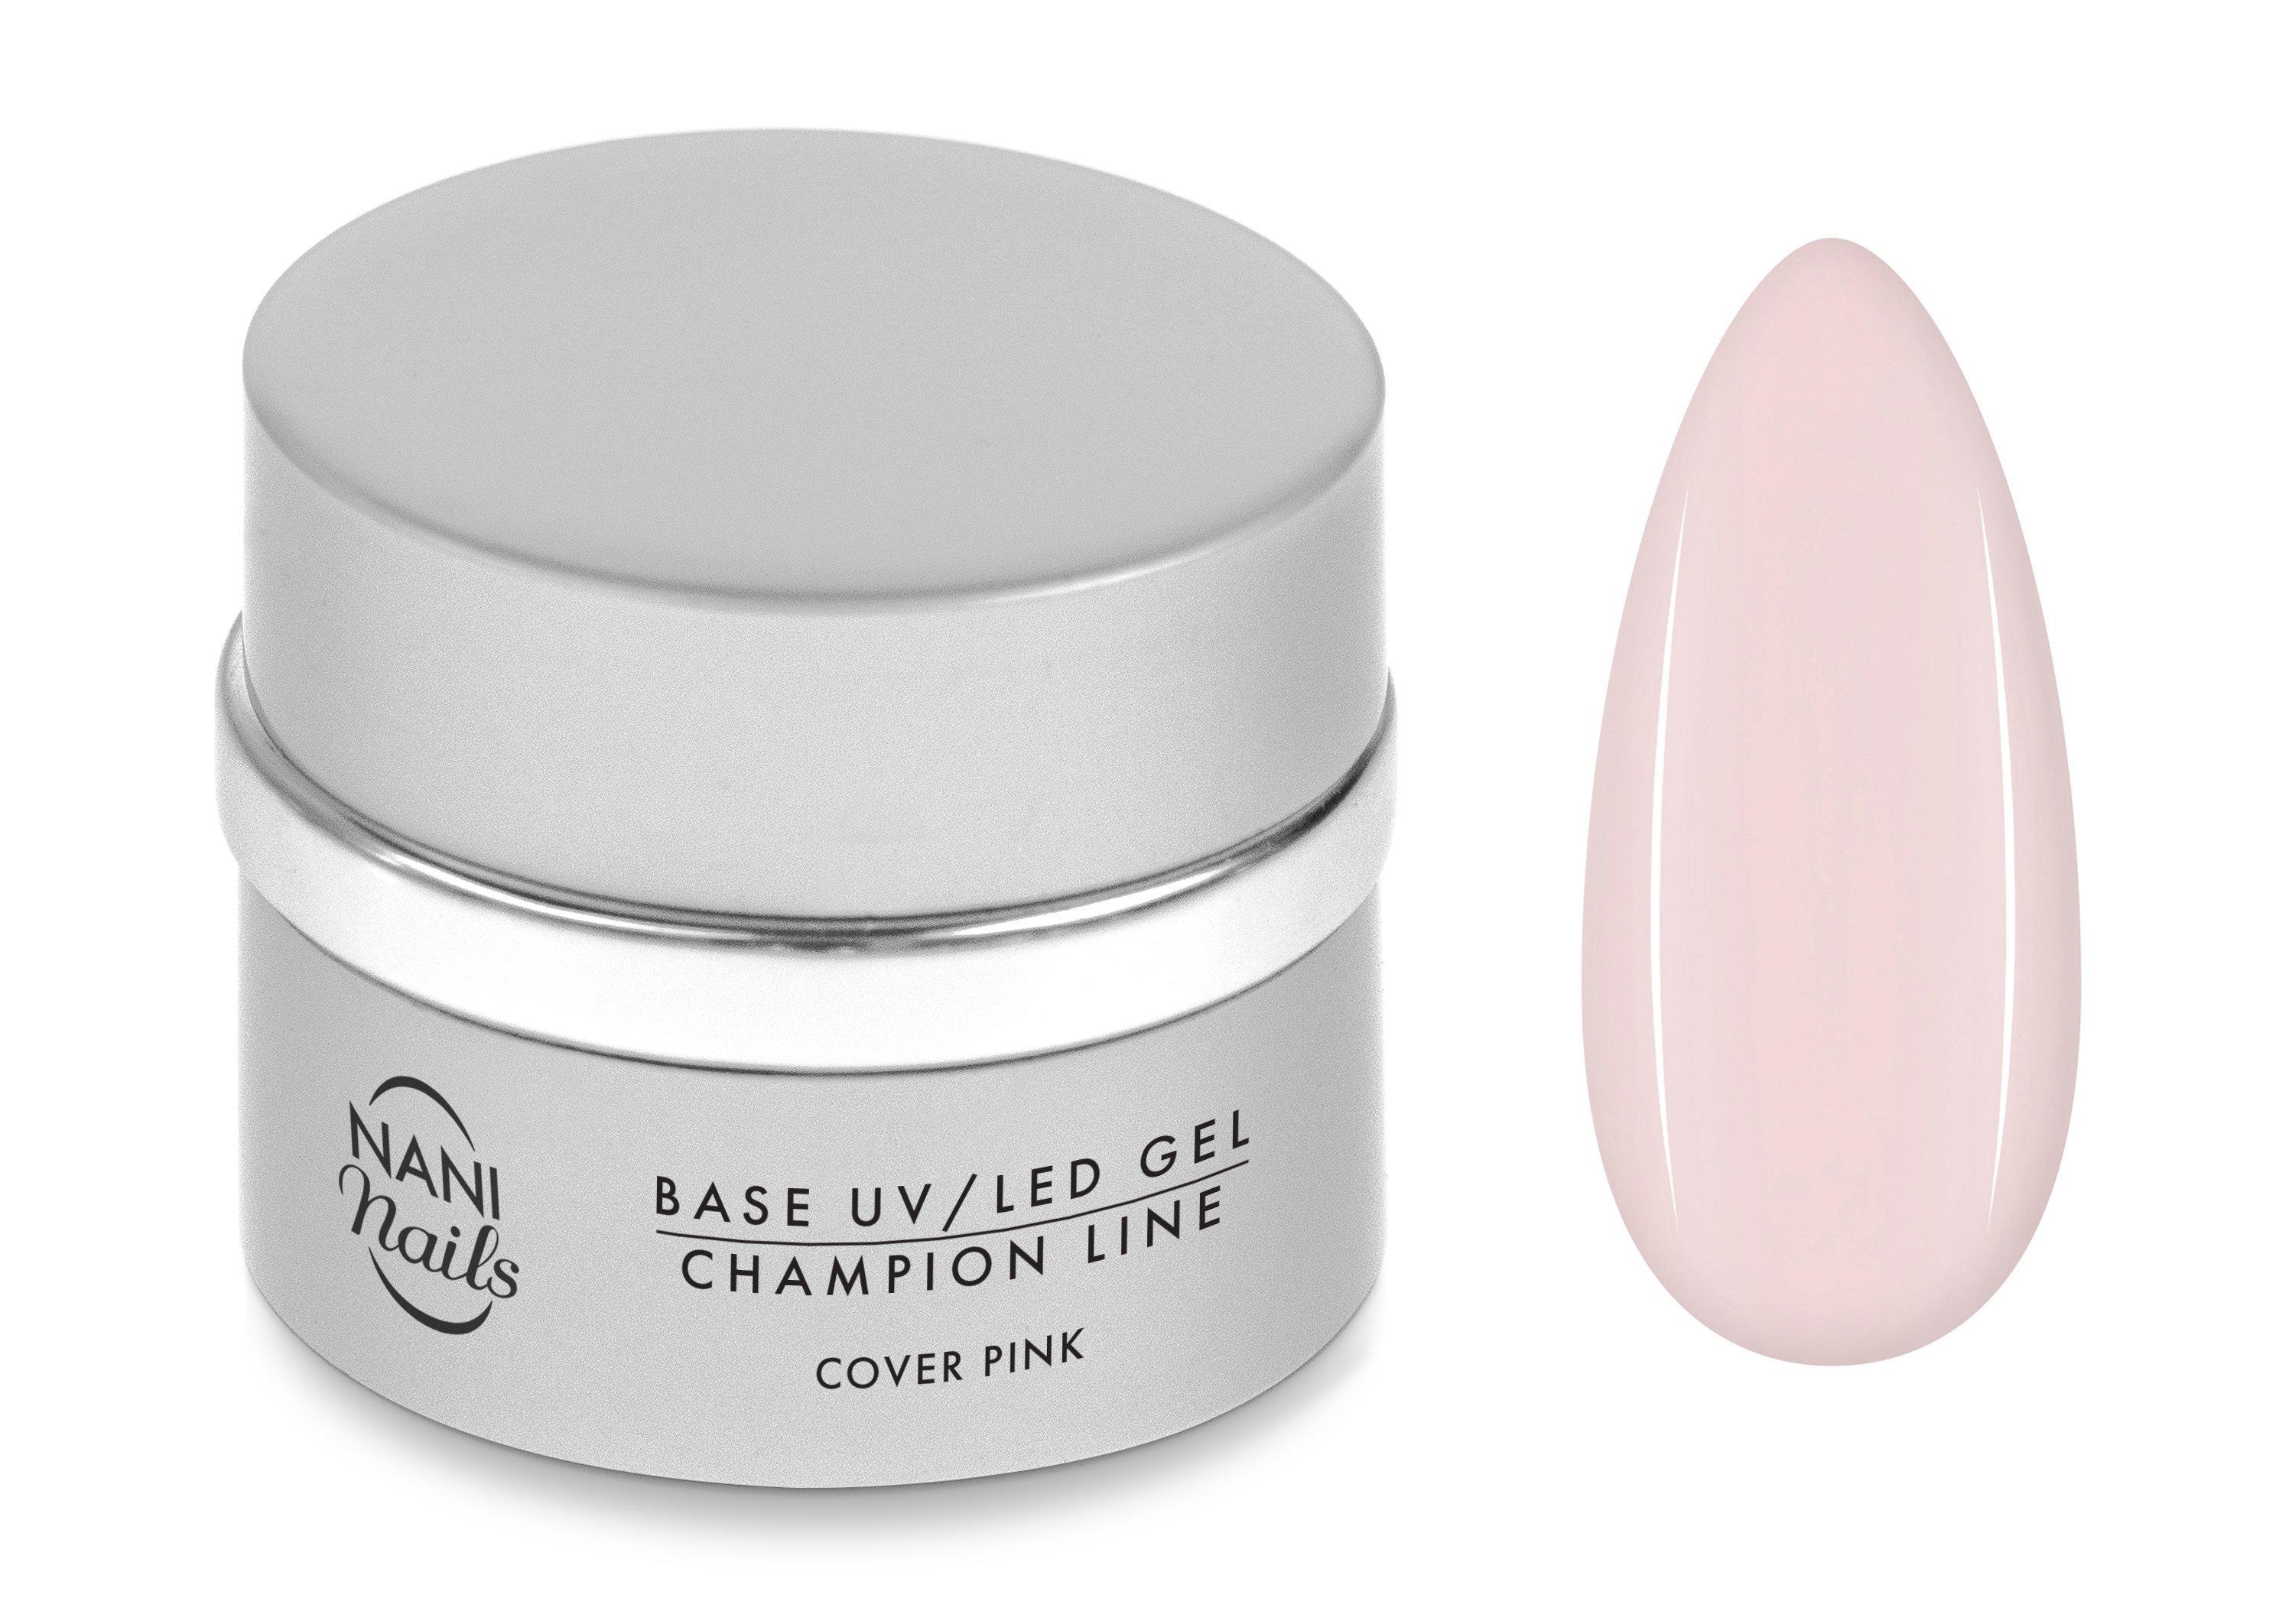 NANI UV/LED gél Champion Line 5 ml - Base Cover Pink